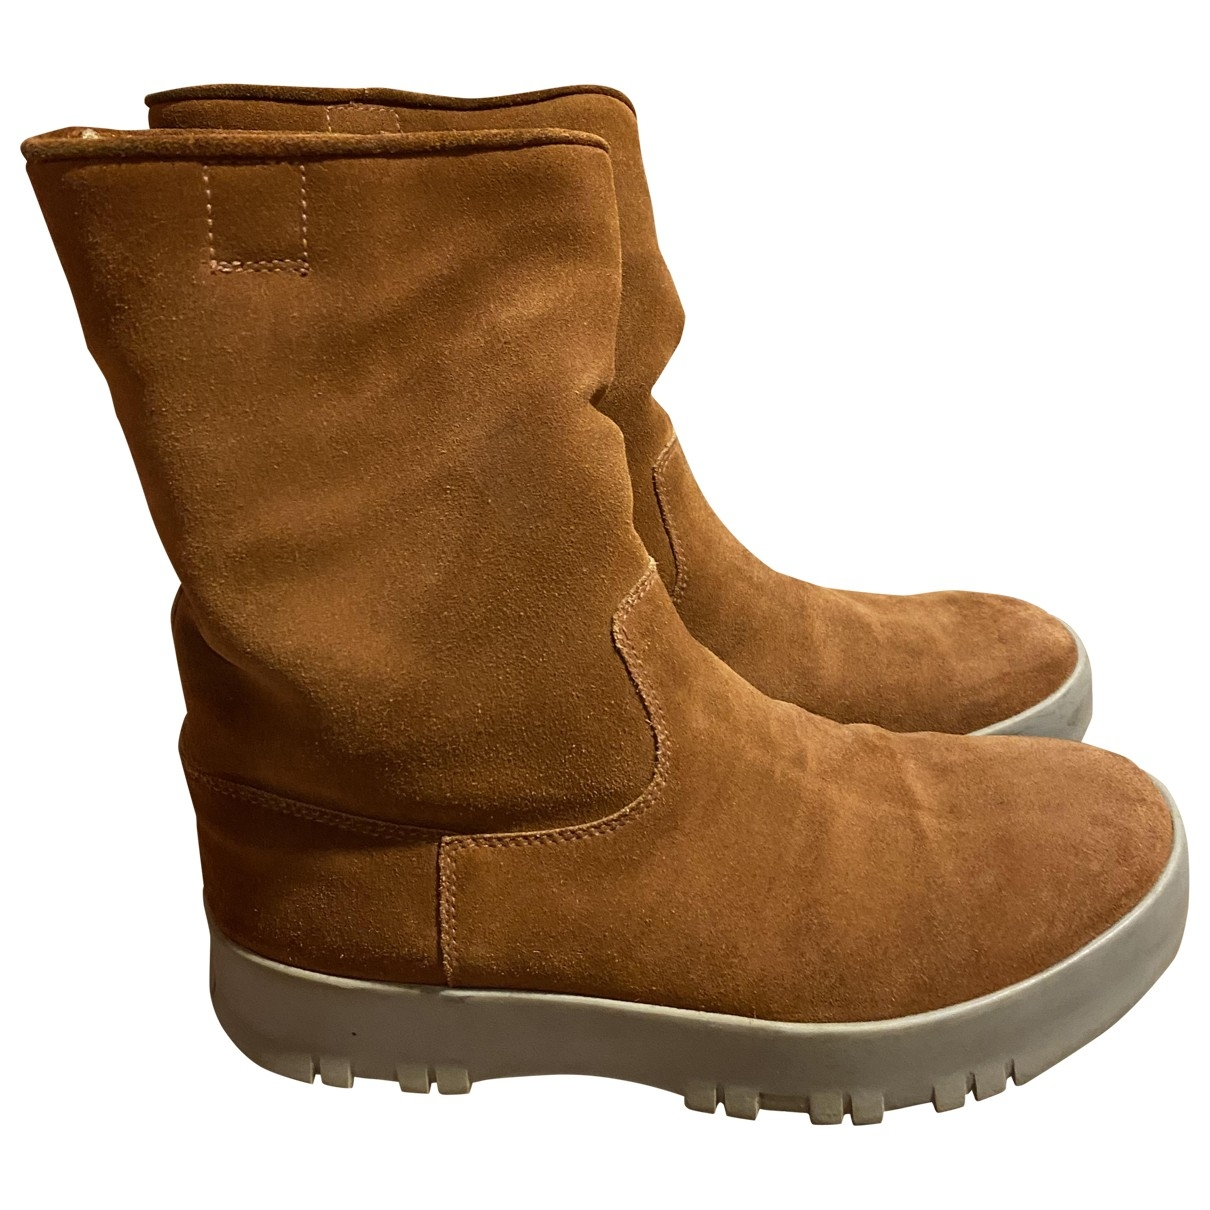 Prada \N Beige Suede Boots for Women 38 EU